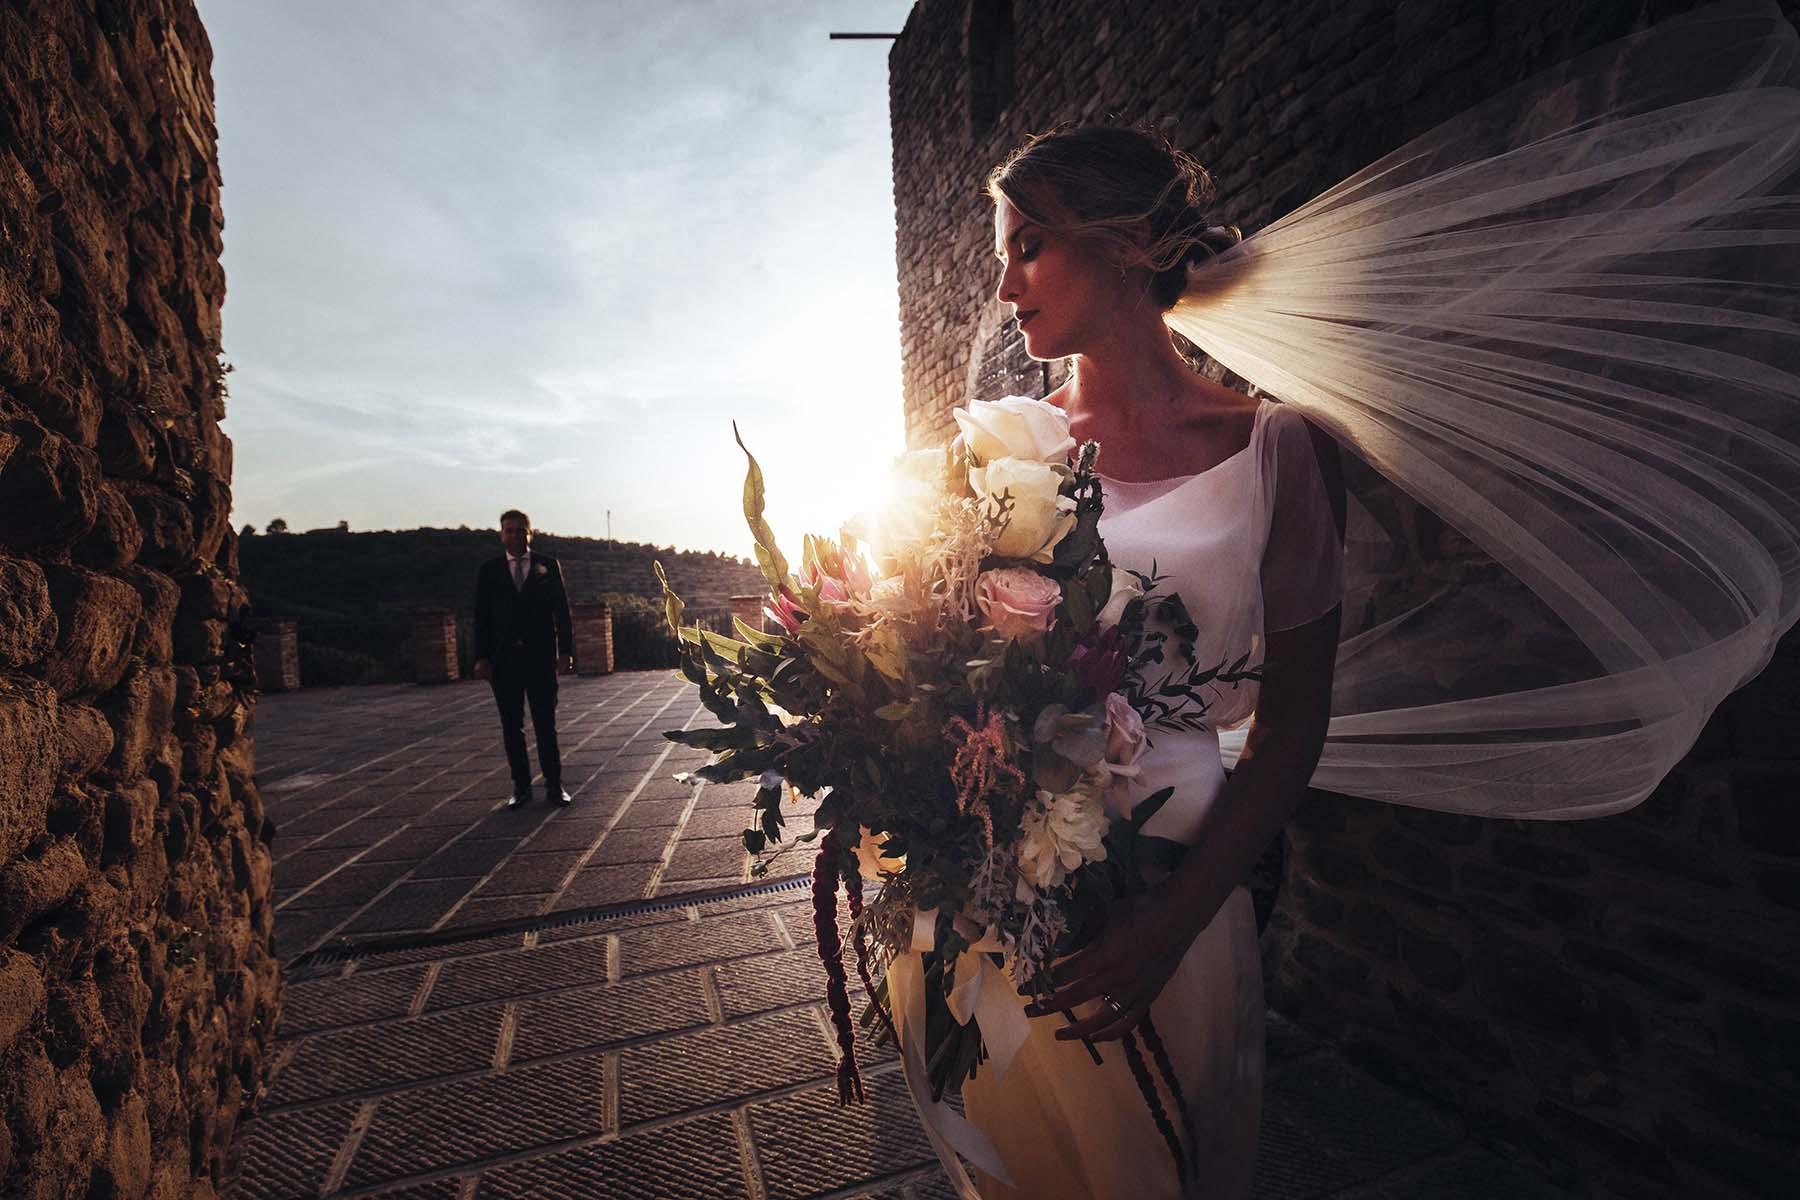 wedding rosciano castle italy 097.jpg